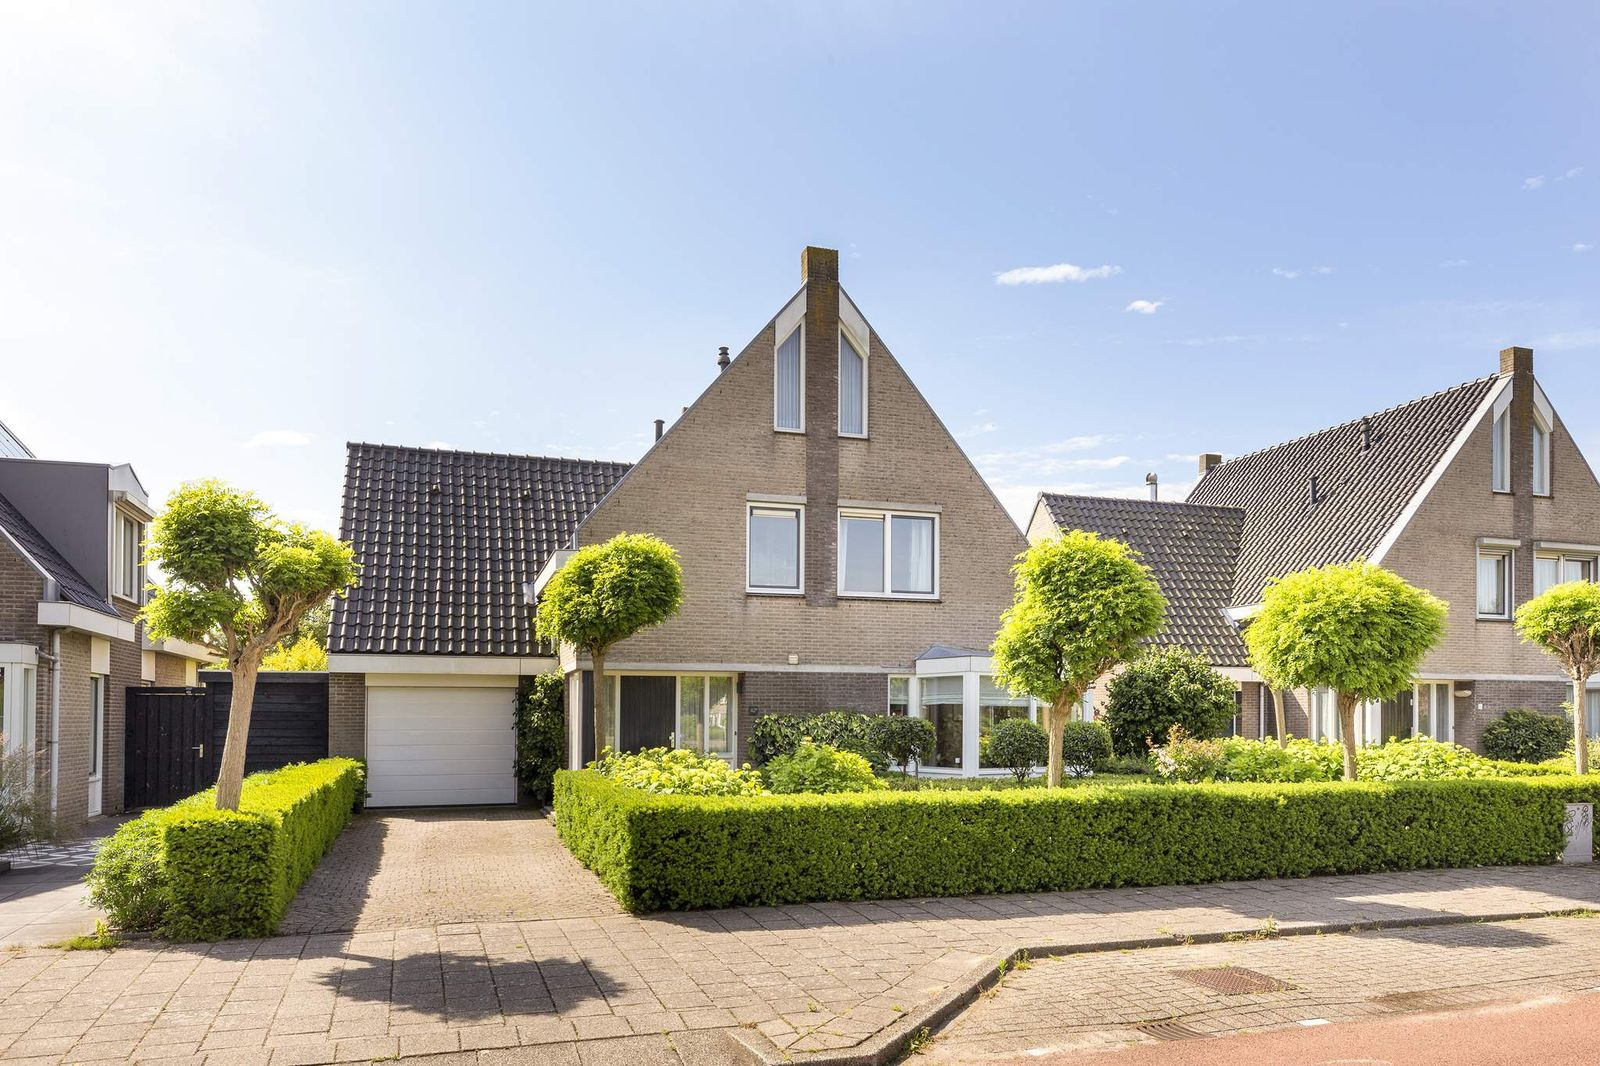 Jan van Kuikweg 42b, Heemskerk